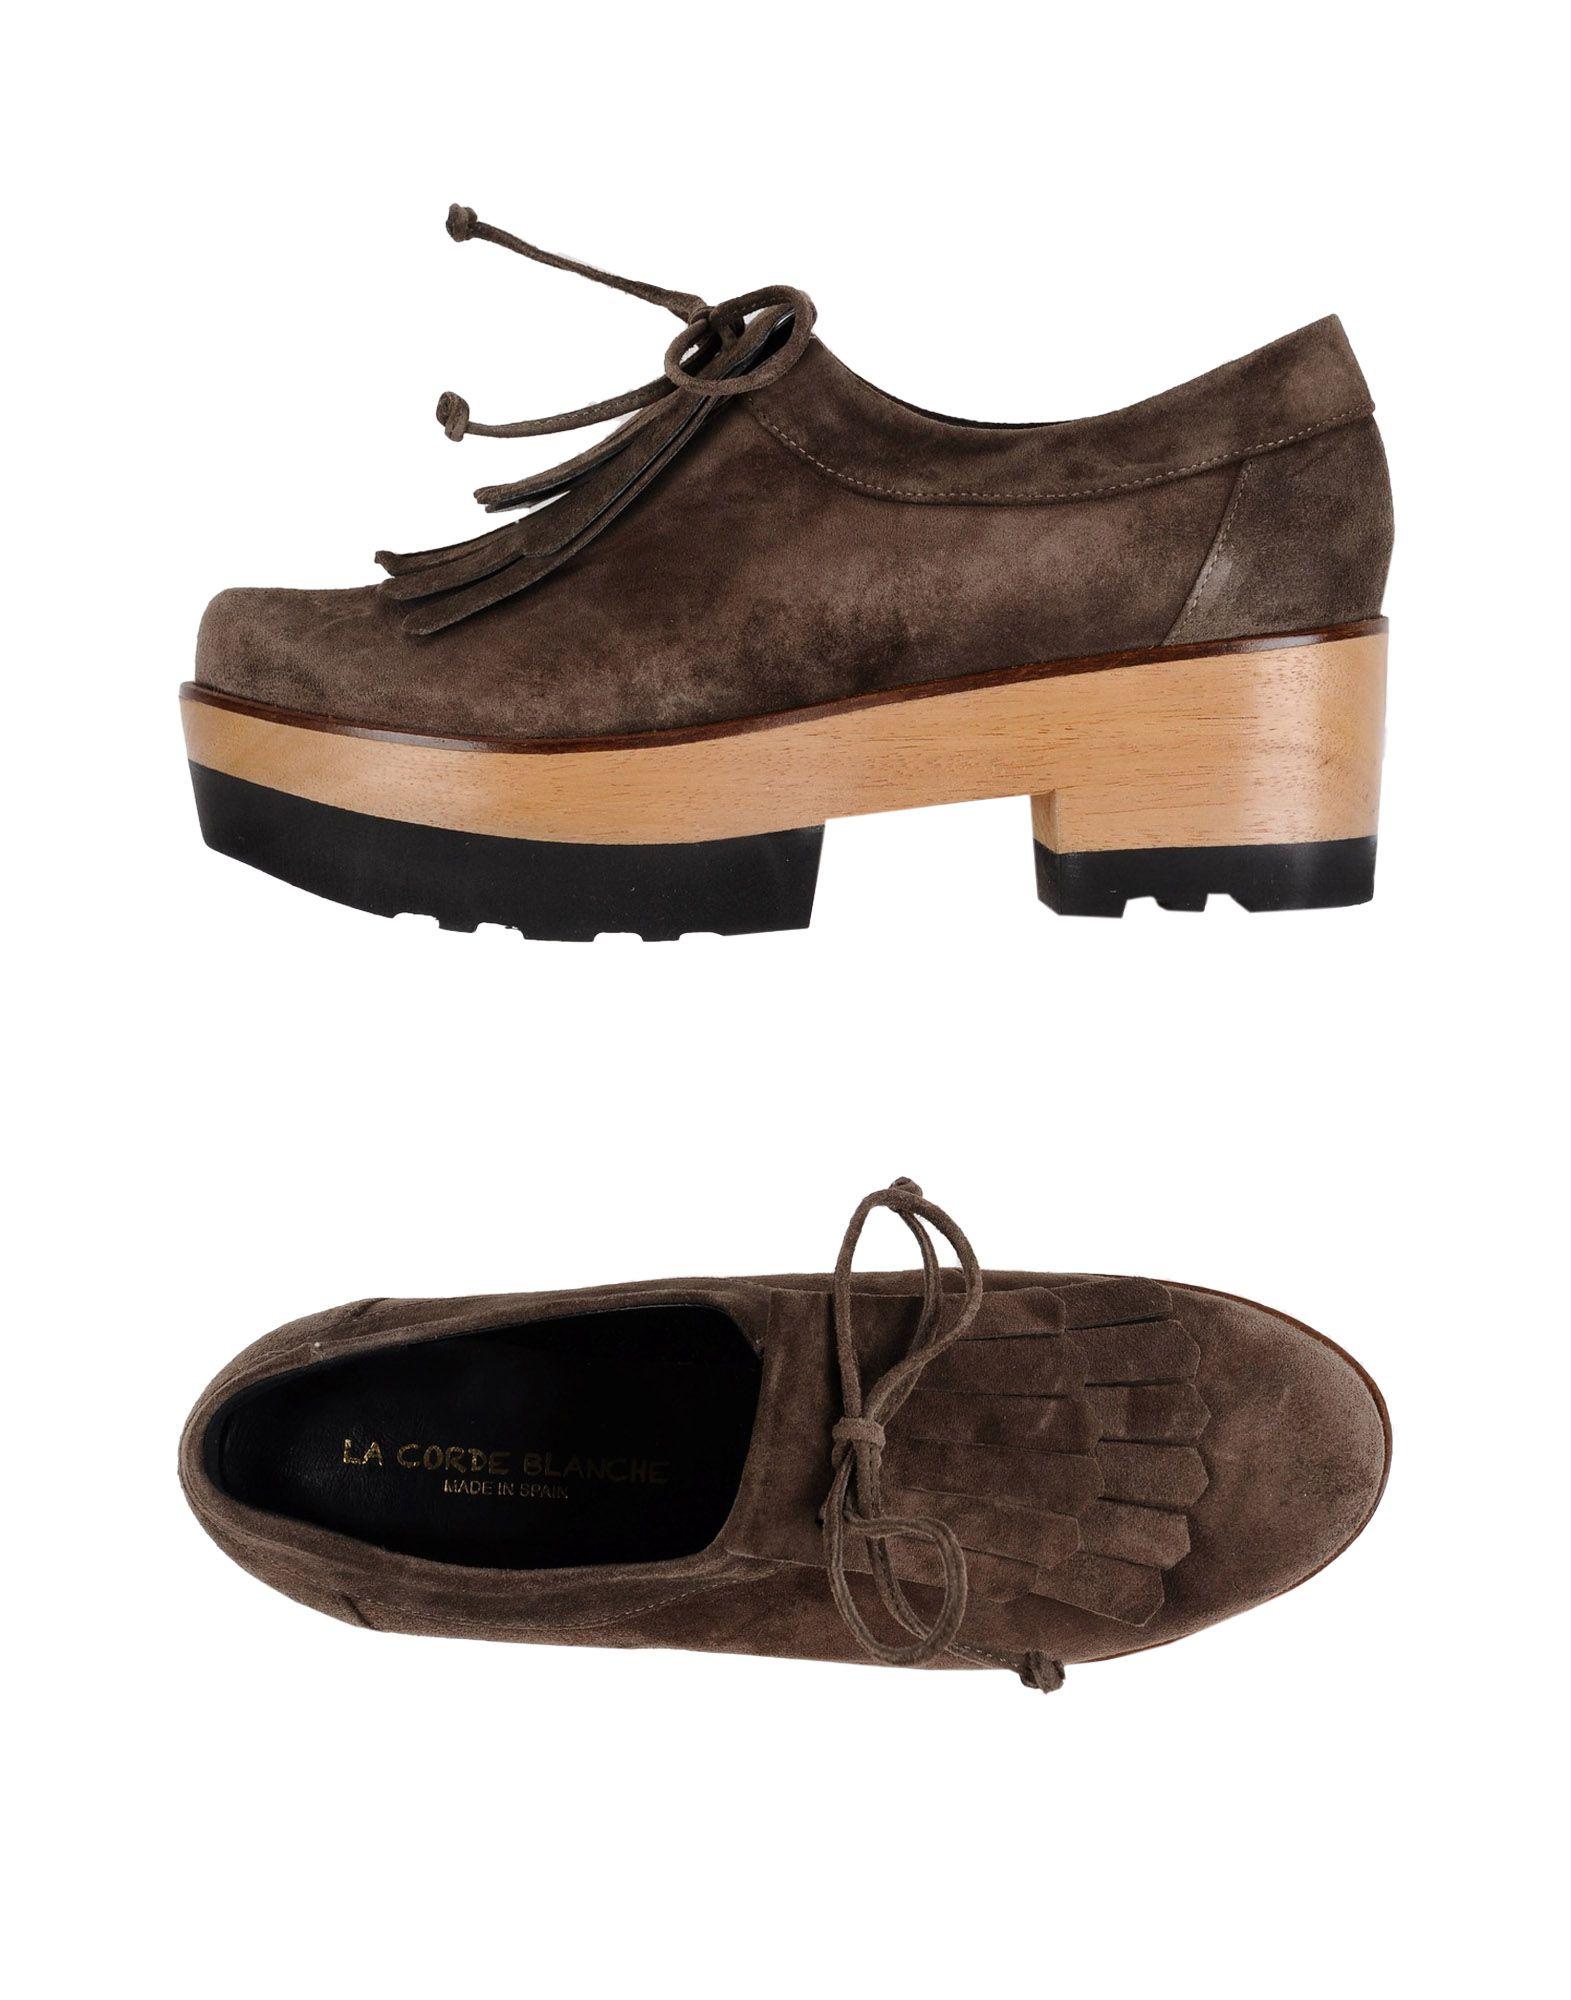 La Corde Blanche Mokassins Damen Schuhe 11144195SH Gute Qualität beliebte  Schuhe 7f2dd4 05136175ab